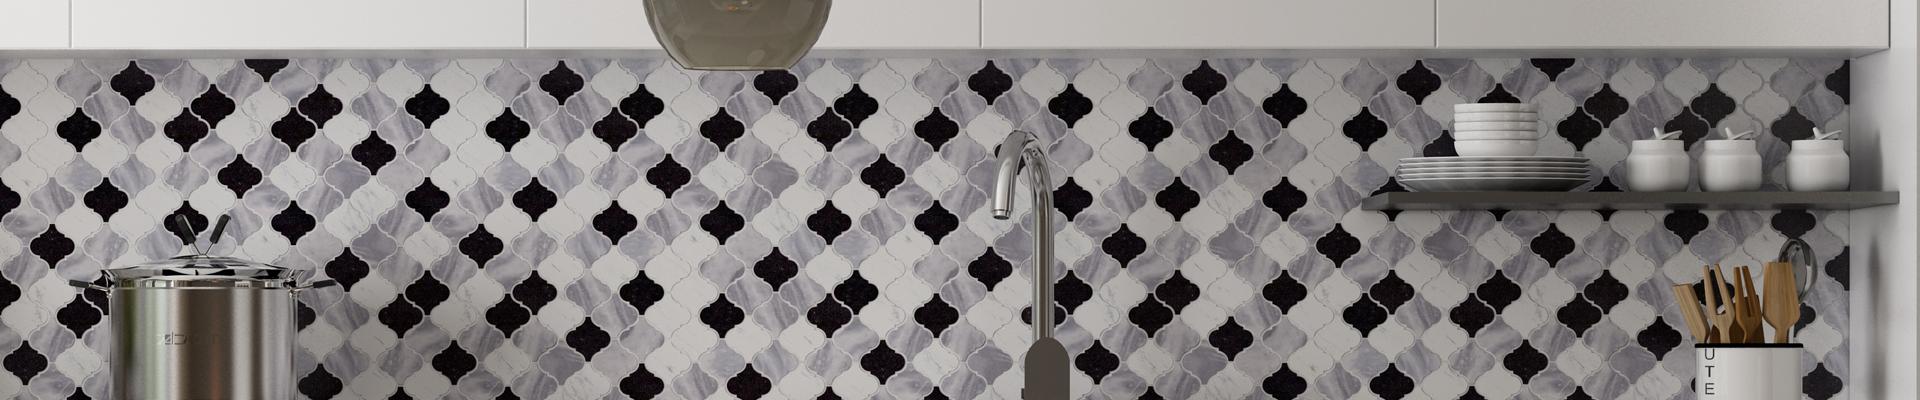 news-porcelain mosaic tile-Heng Xing-img